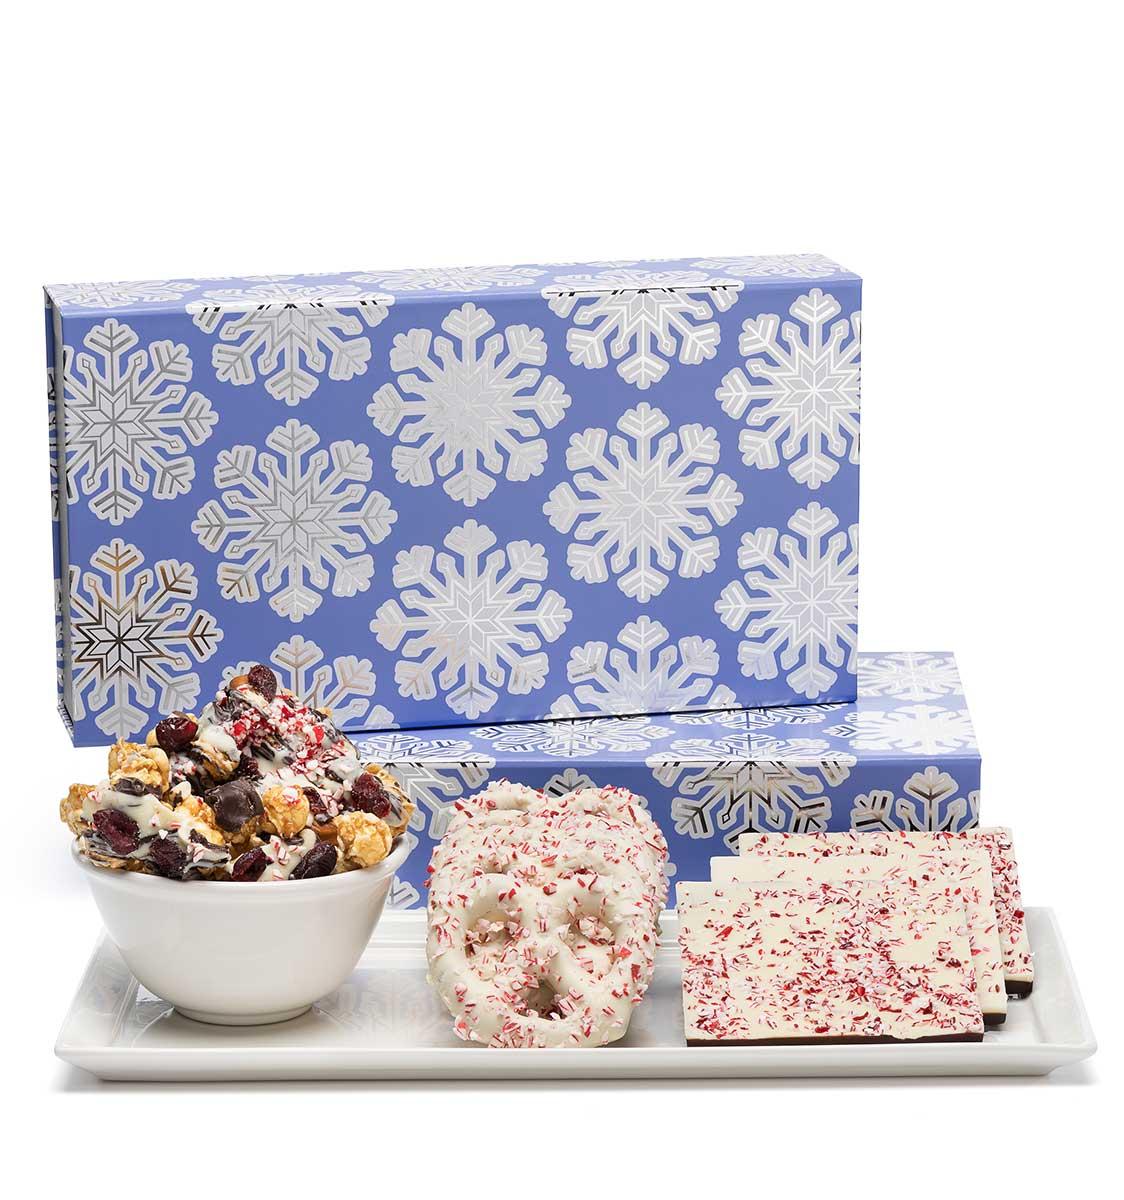 ready-gift-chocolate-SHX230766T-shimmering-snowflake-peppermint-popcorn-pretzels-bark-luxury-tasting-box-1